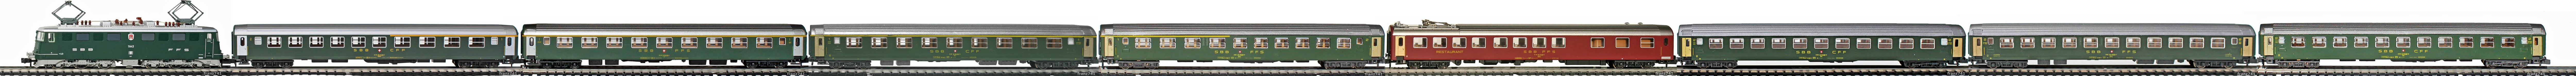 Epoche-IV-SBB-UIC-Personenzug_Ae-6-6-Elok-UIC-Wagen-altes-Logo